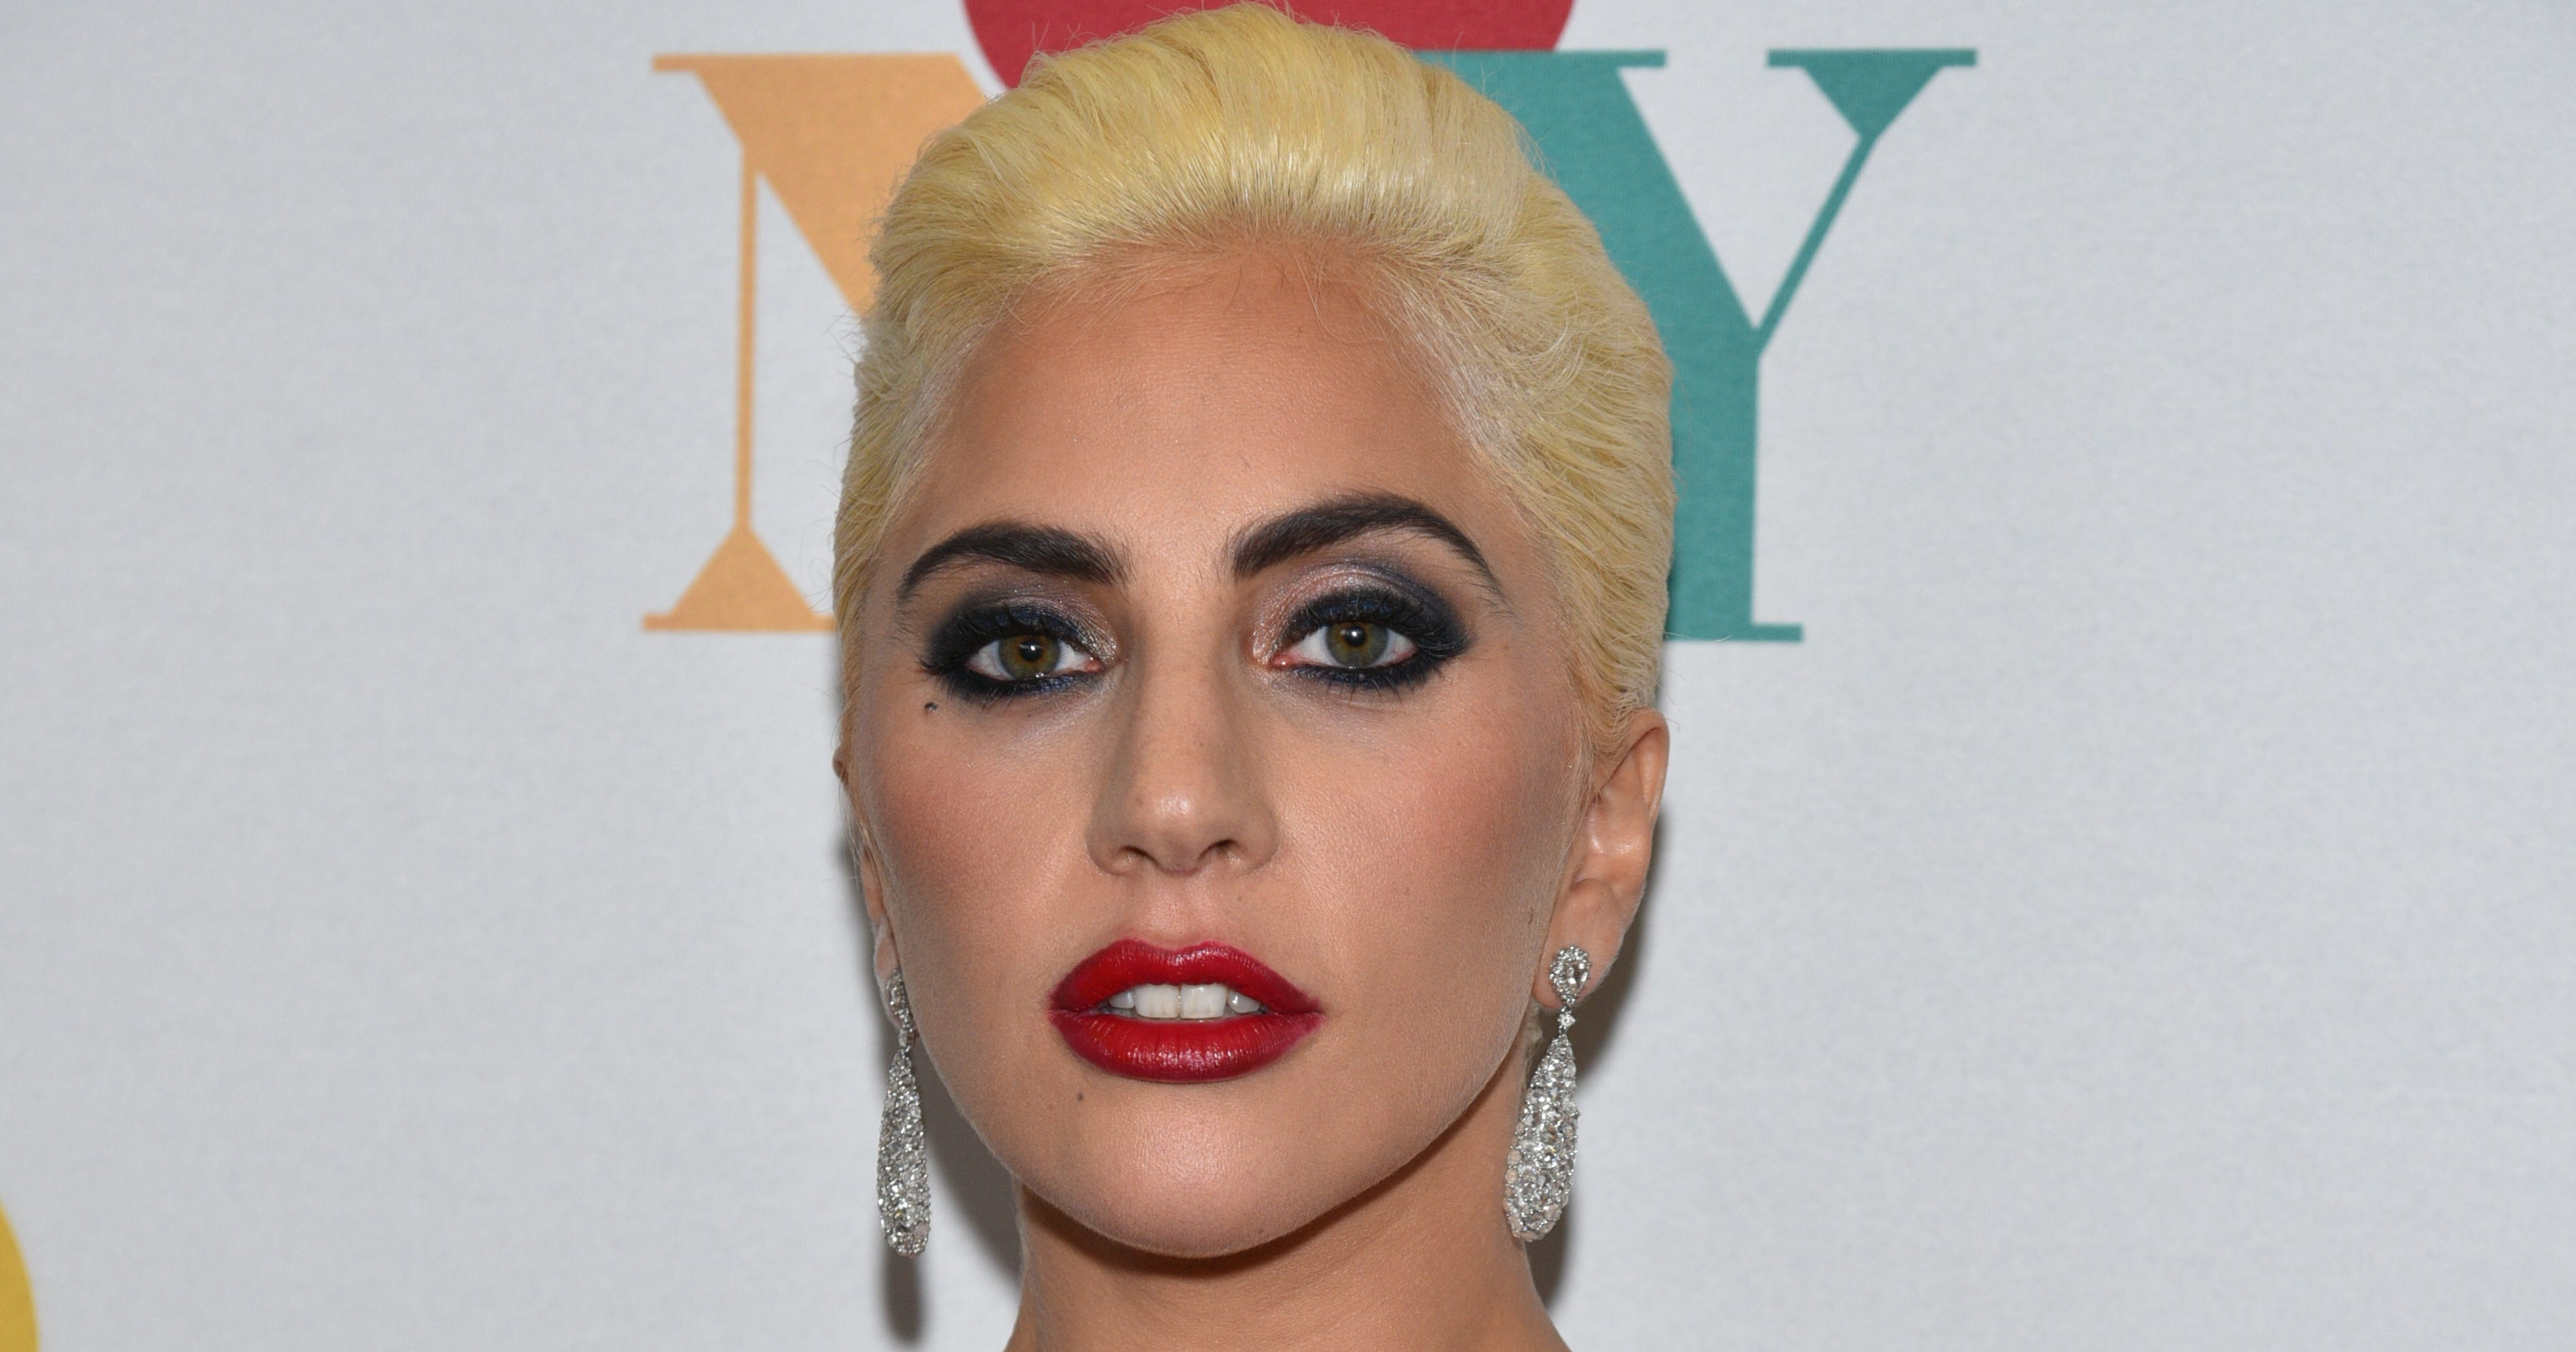 Lady Gaga AHS Roanoke Sex Scene Cuba Gooding Jr Memes